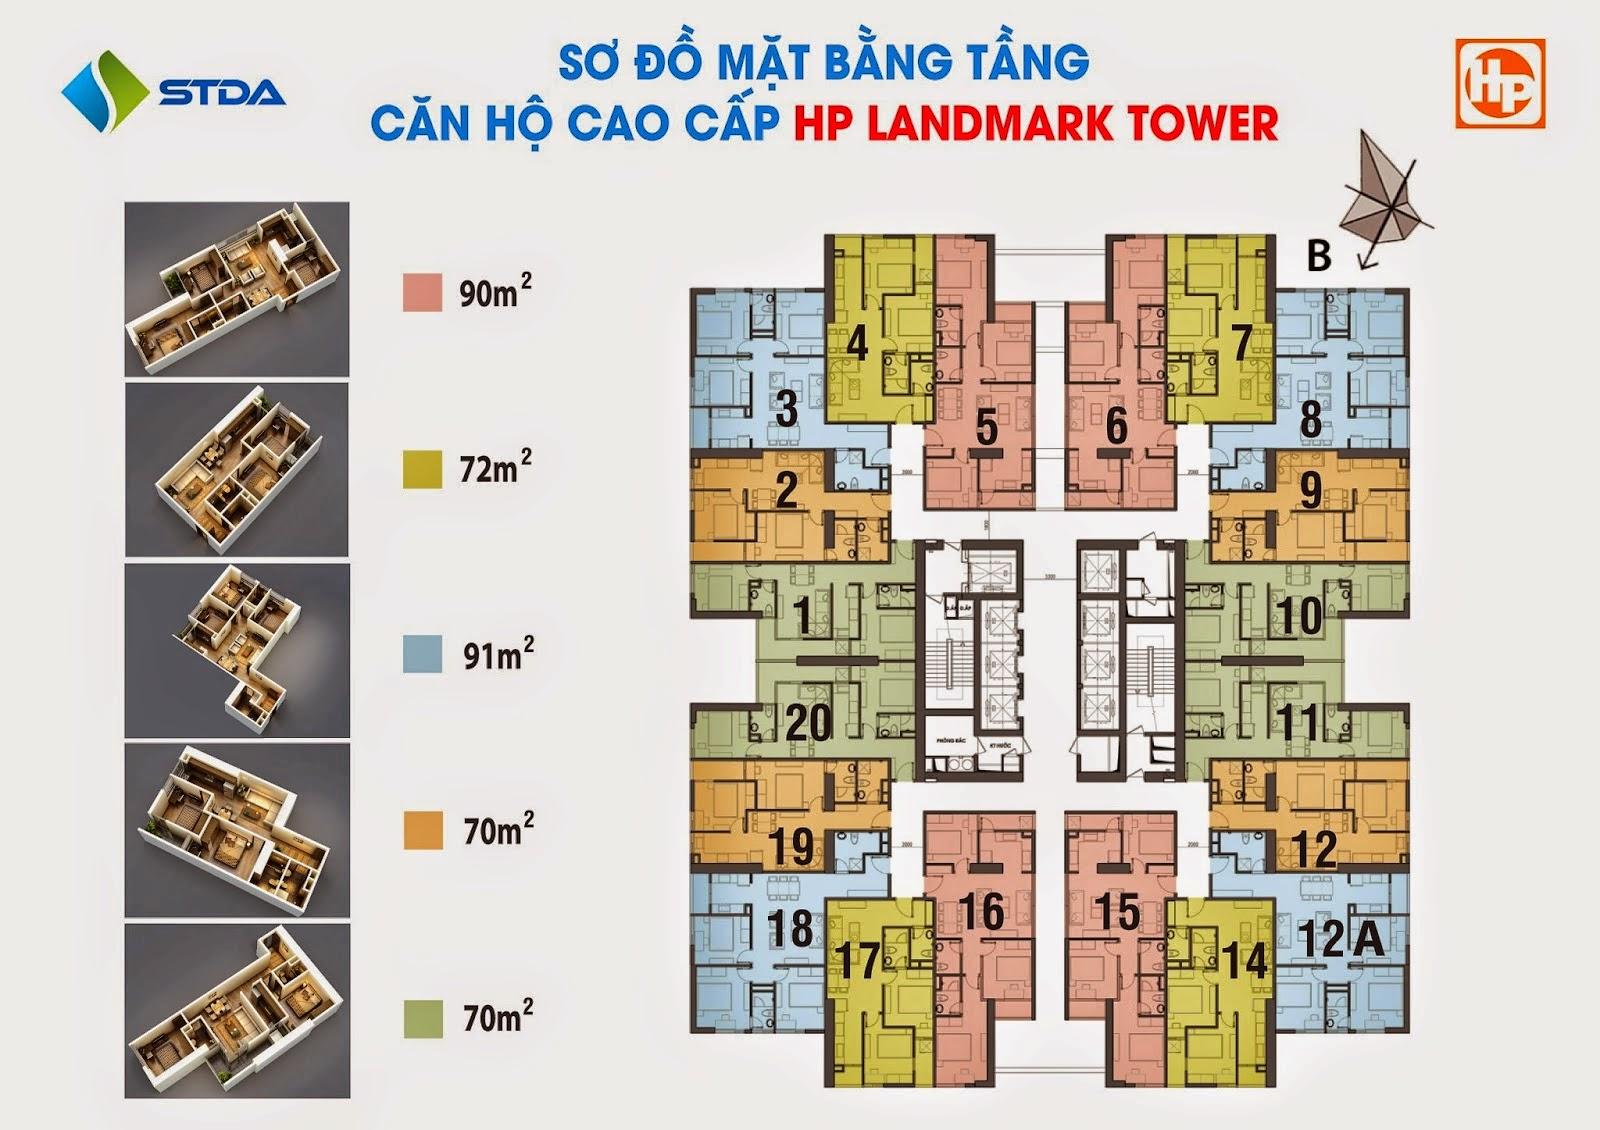 MẶT BẰNG cư xá HP LANDMARK TOWER